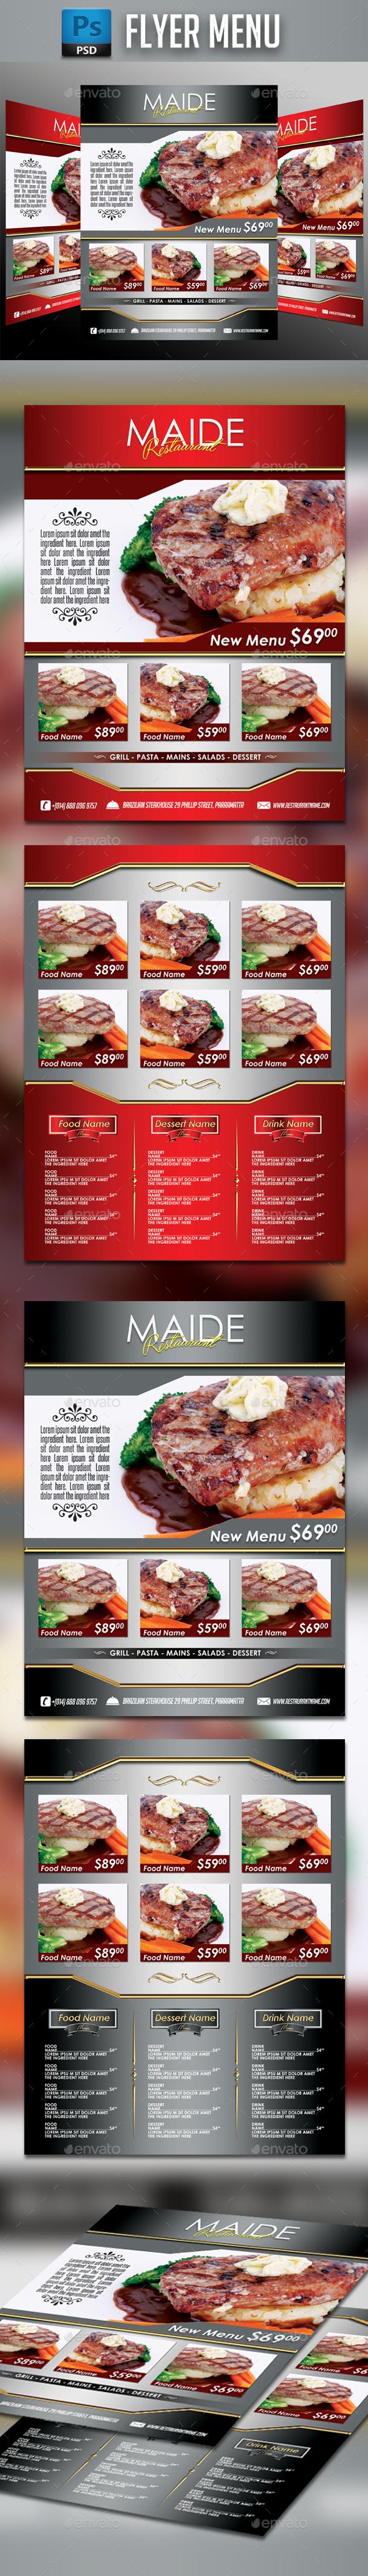 Restaurant Menu #11 - Food Menus Print Templates